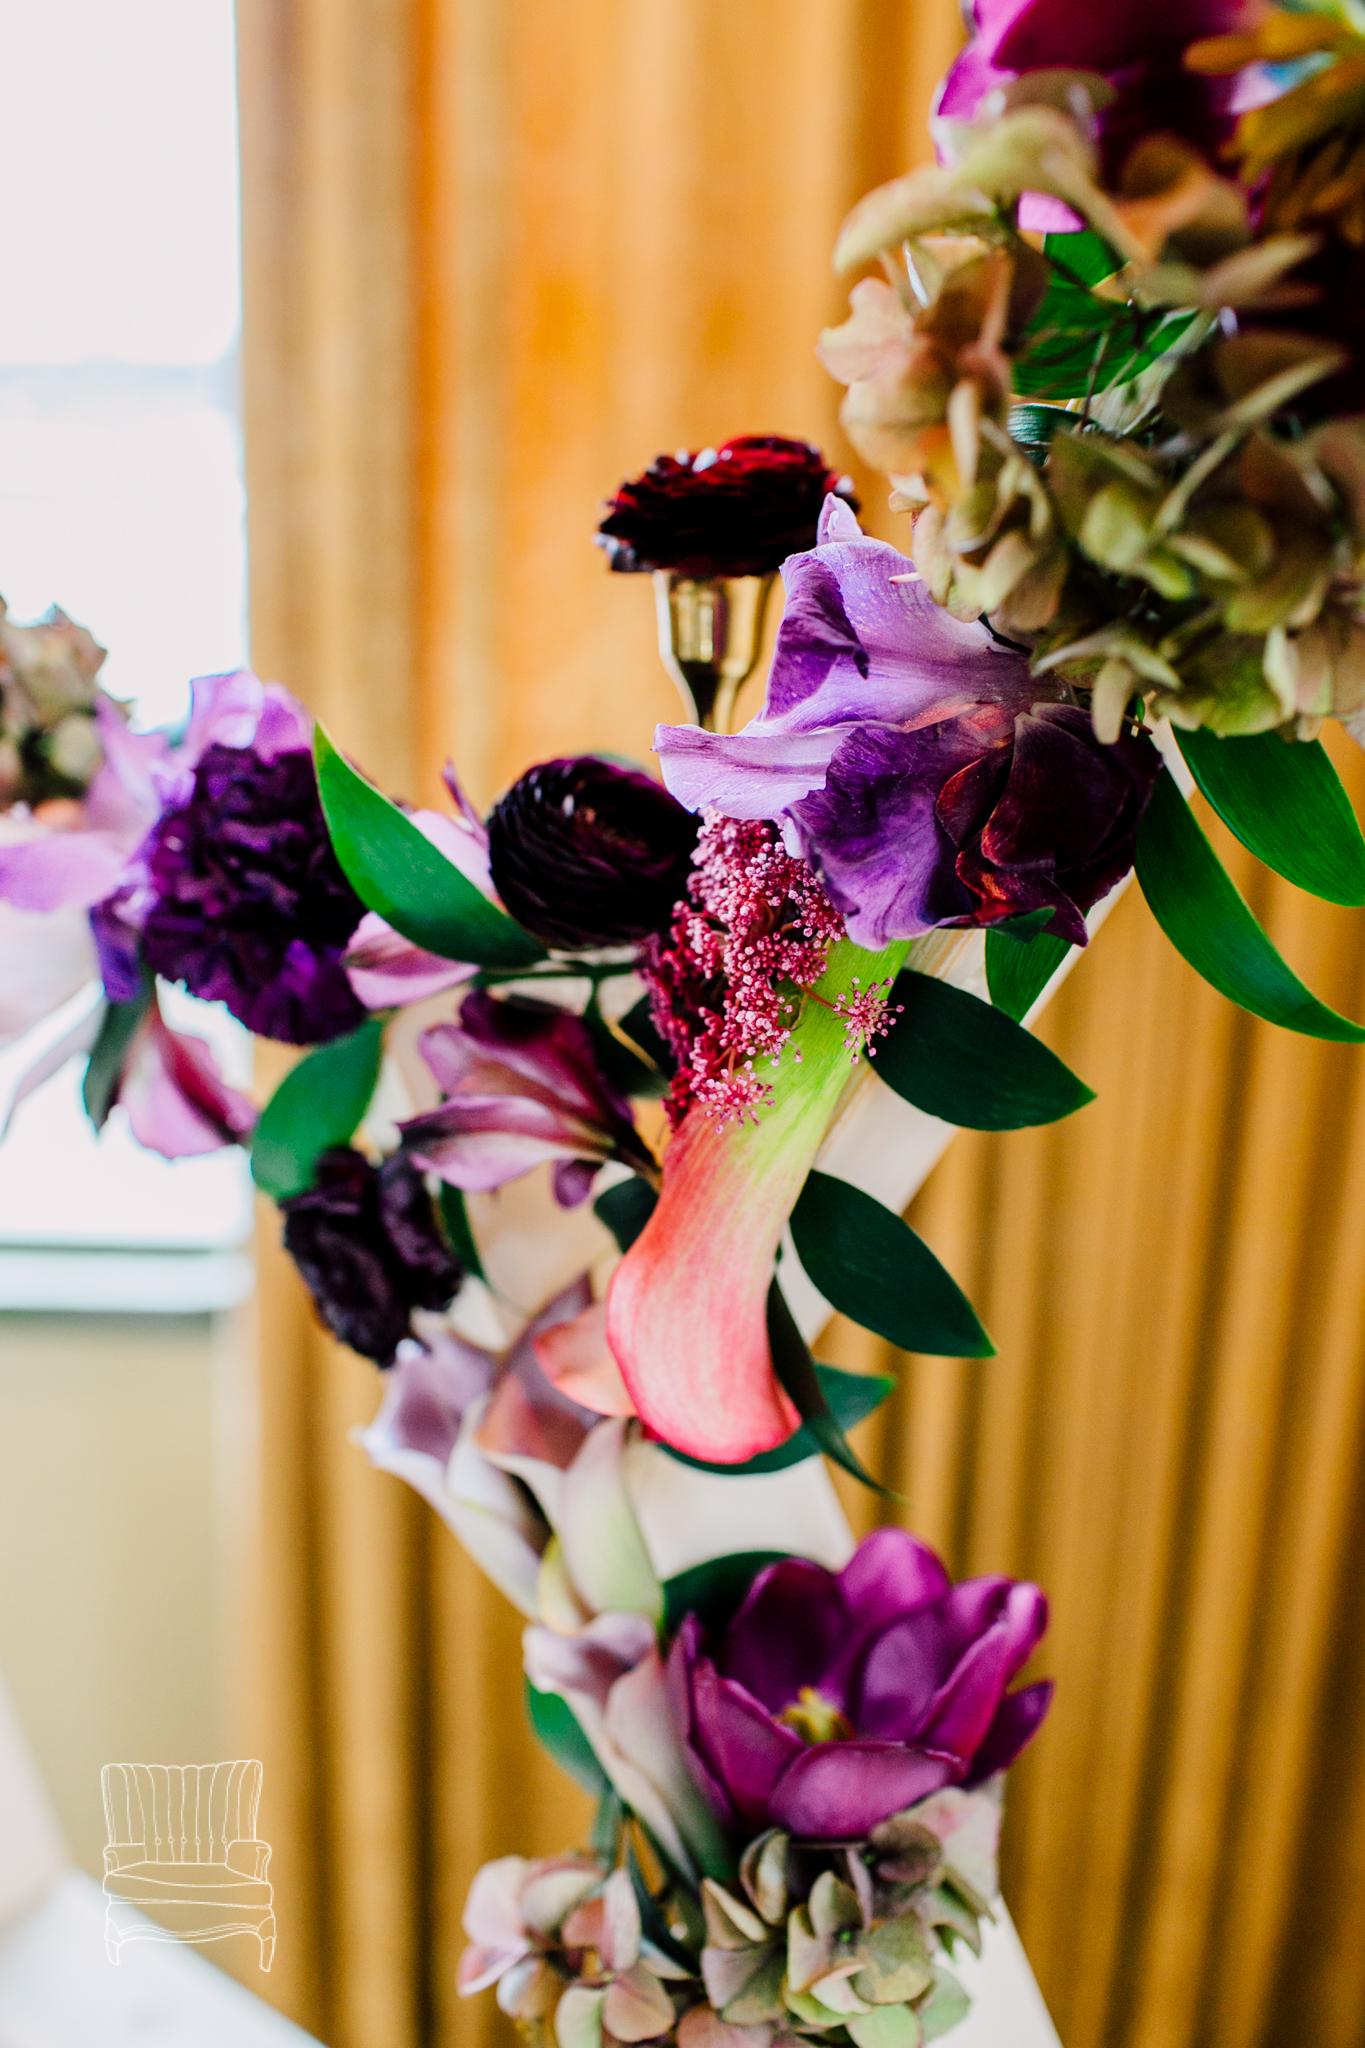 bellwether-hotel-bellingham-wedding-photographer-katheryn-moran-glitz-glam-styled-460.jpg